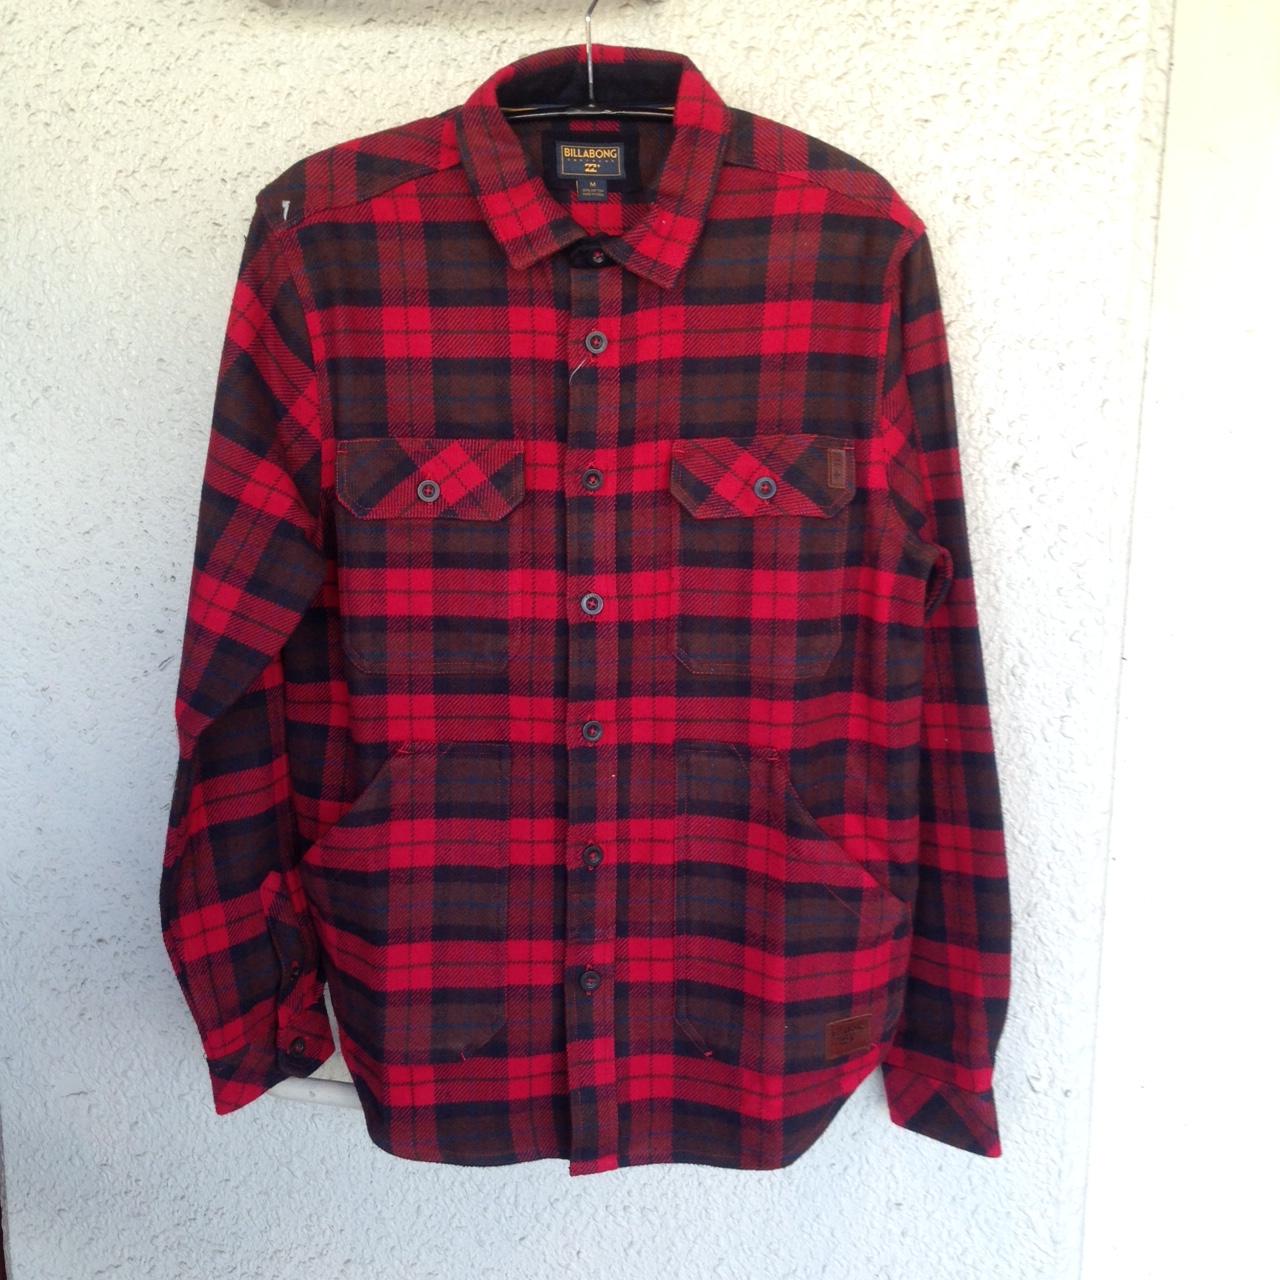 BILLABONGからフランネルシャツ ジャケット